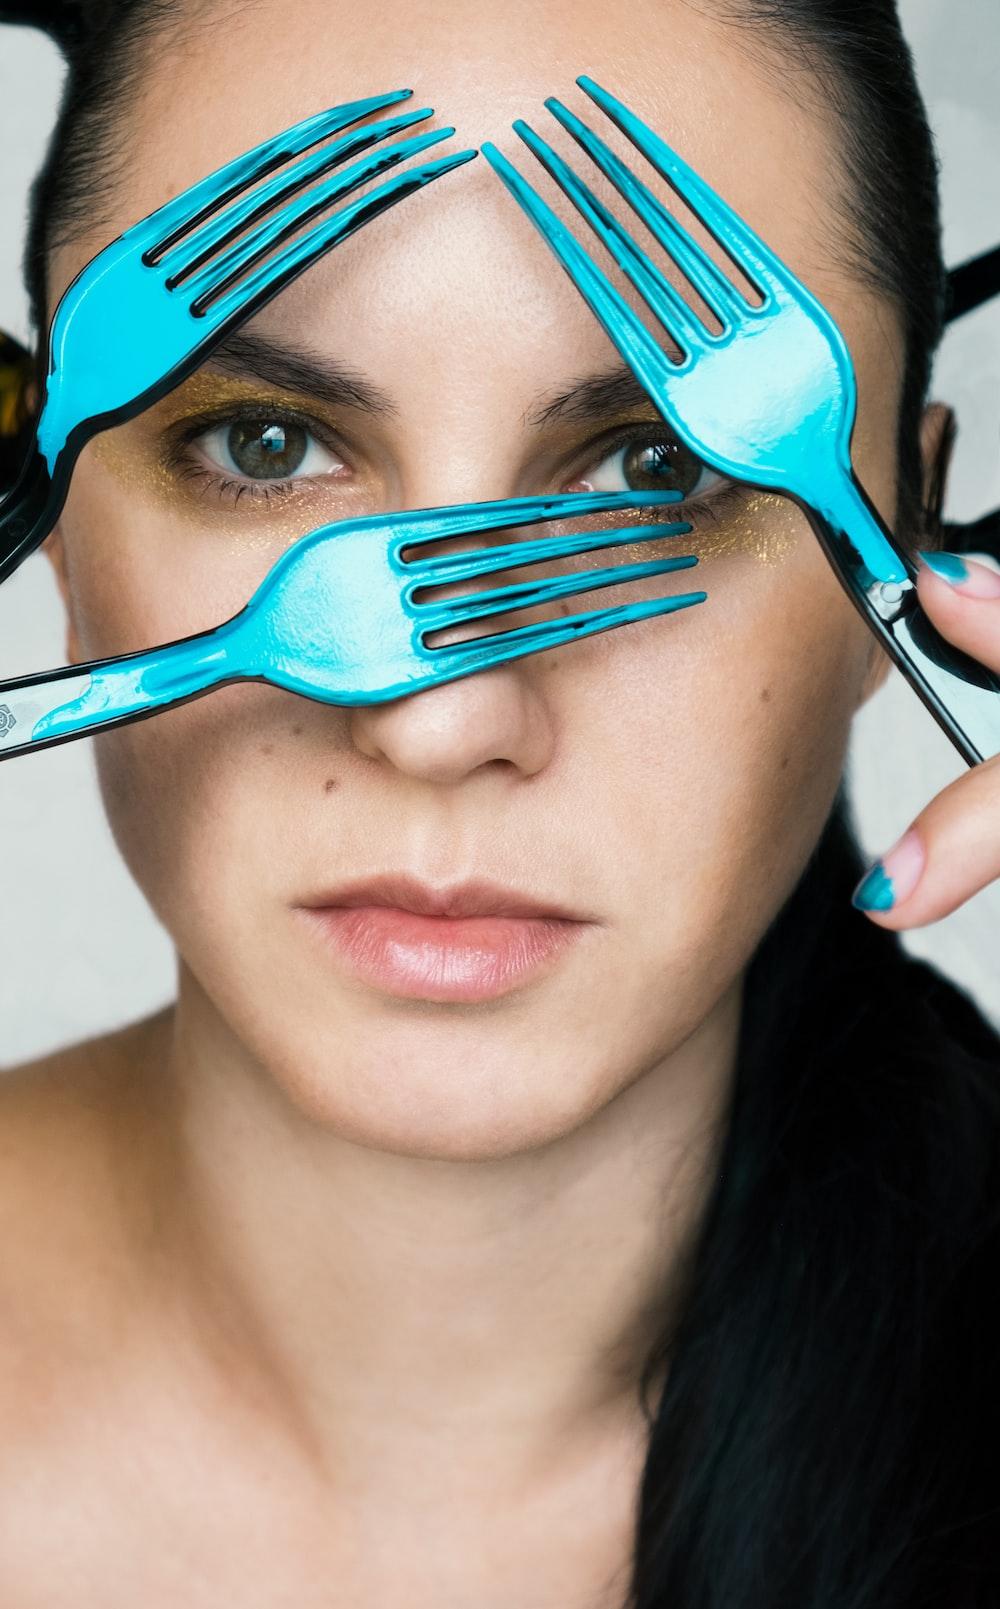 woman holding blue plastic fork